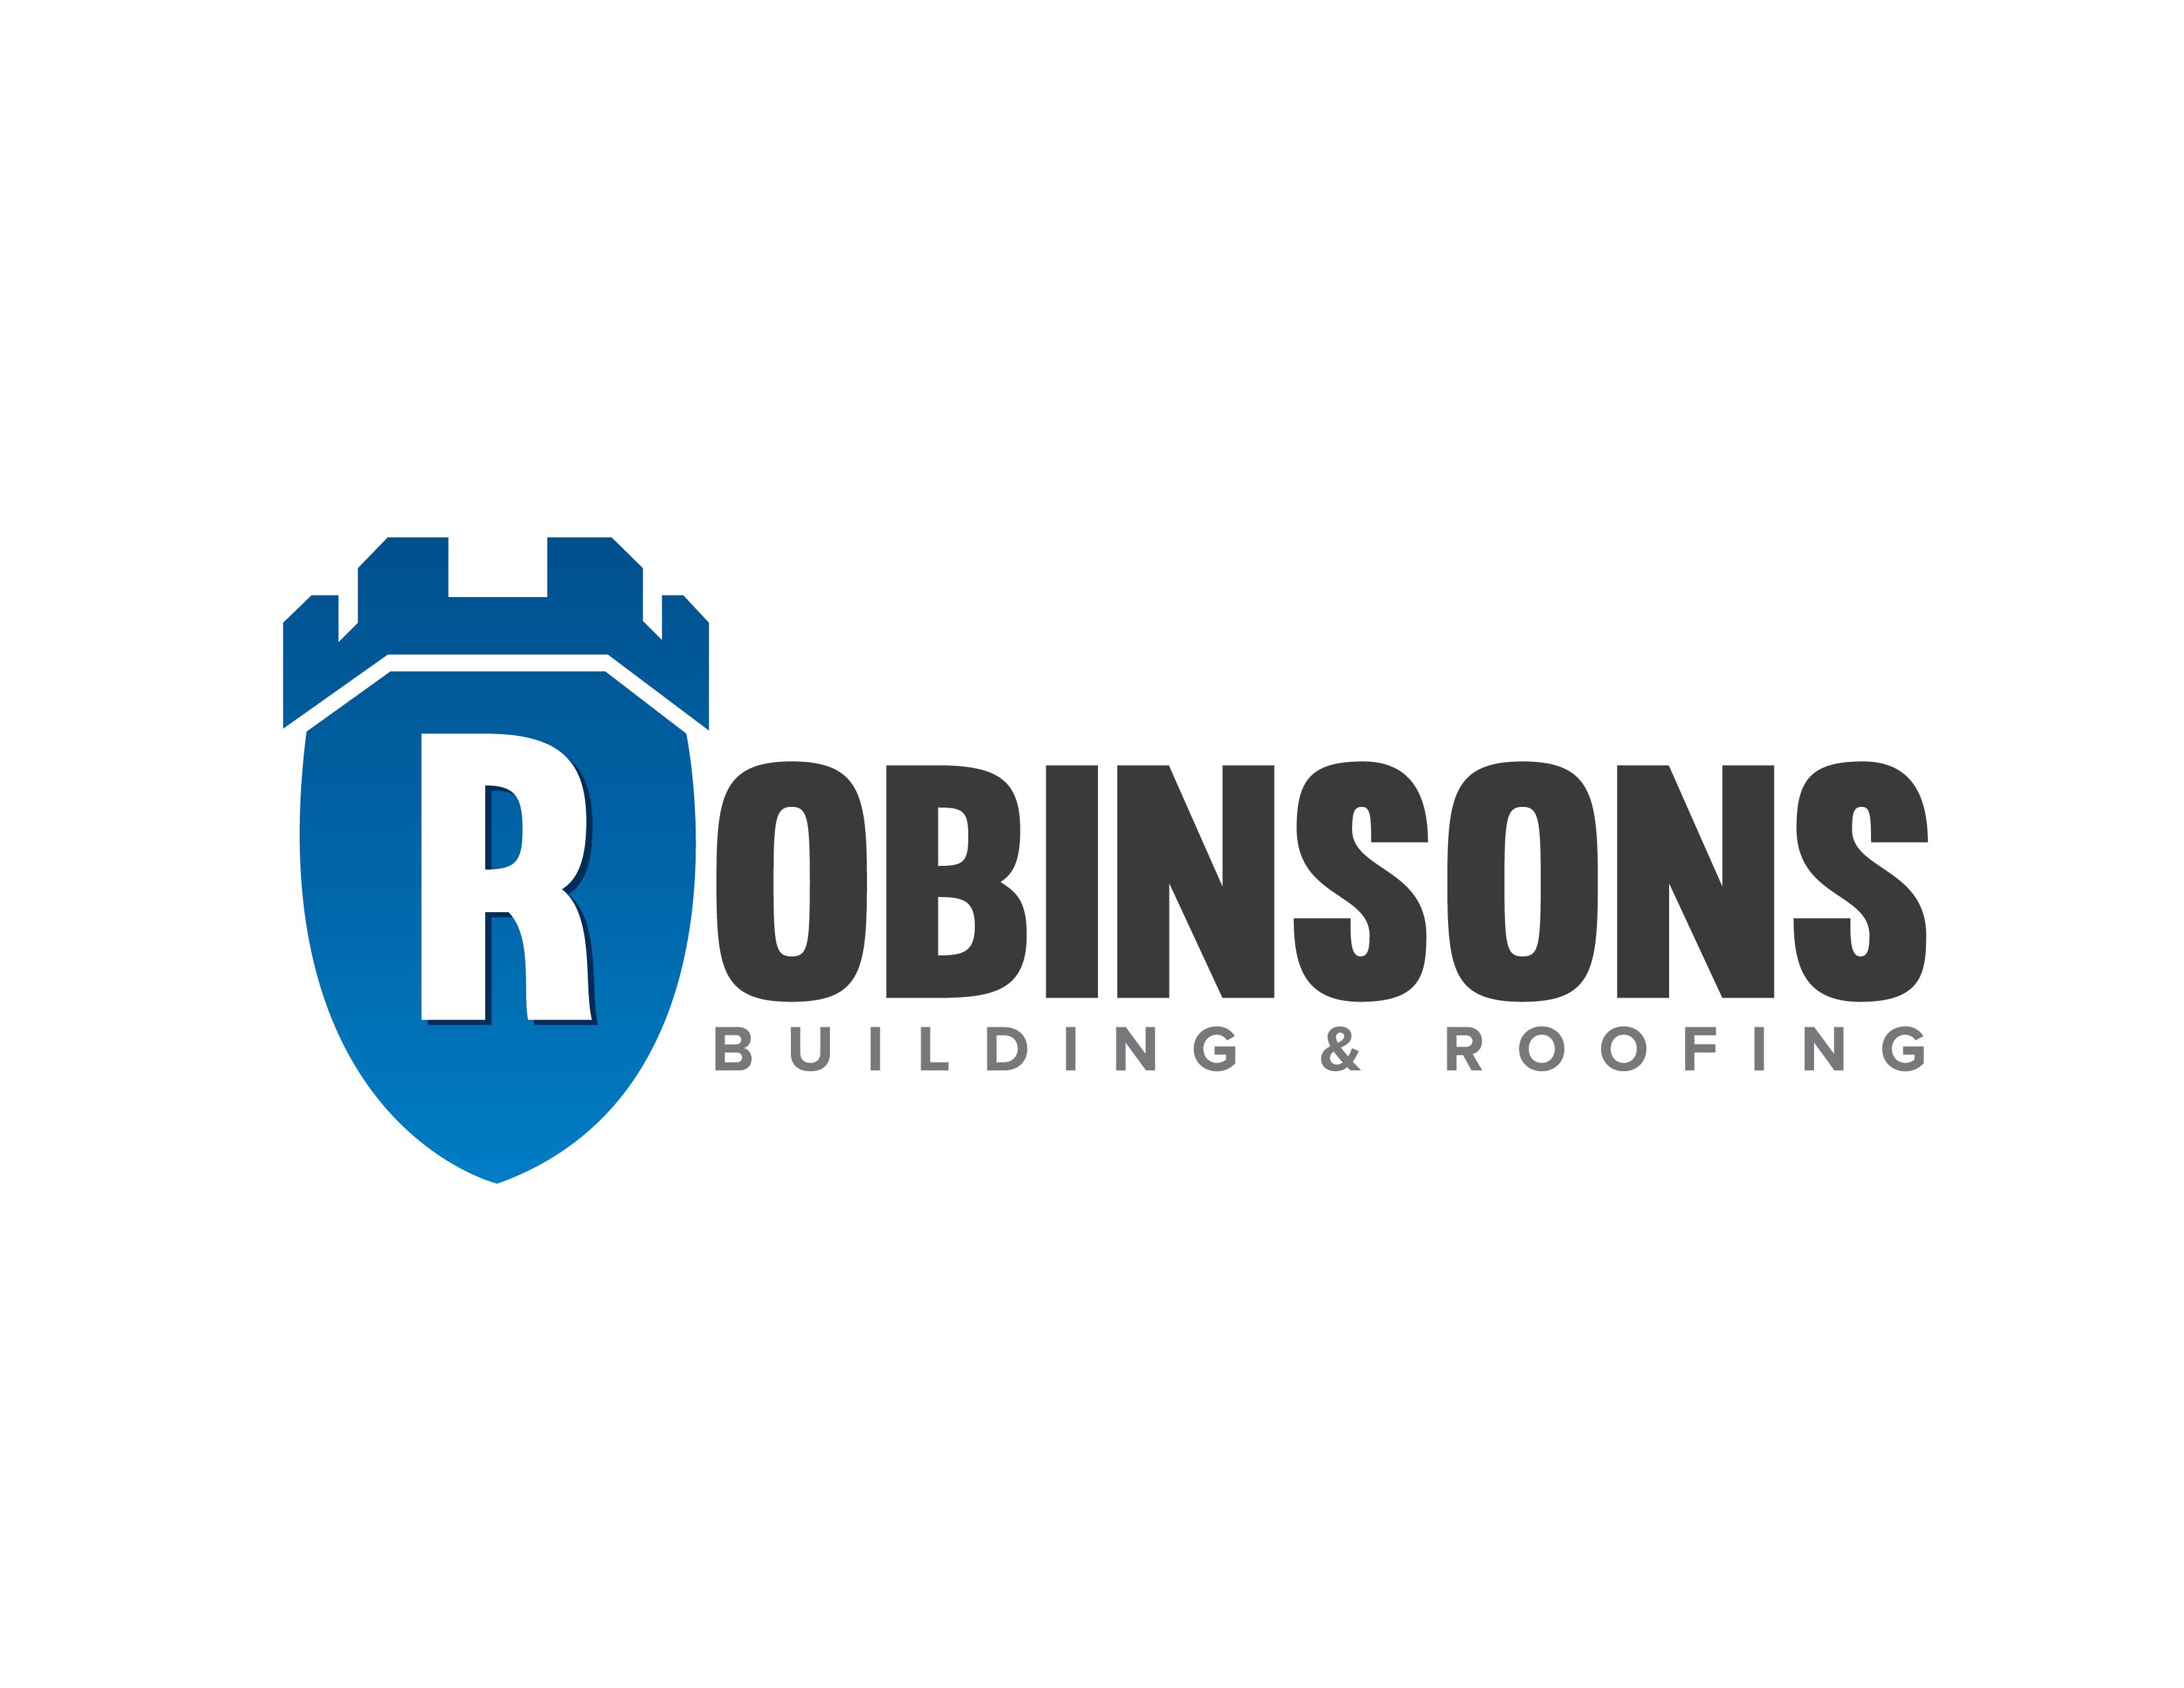 Robinson Roofing - Littlehampton, West Sussex BN16 1BS - 07709 443003 | ShowMeLocal.com